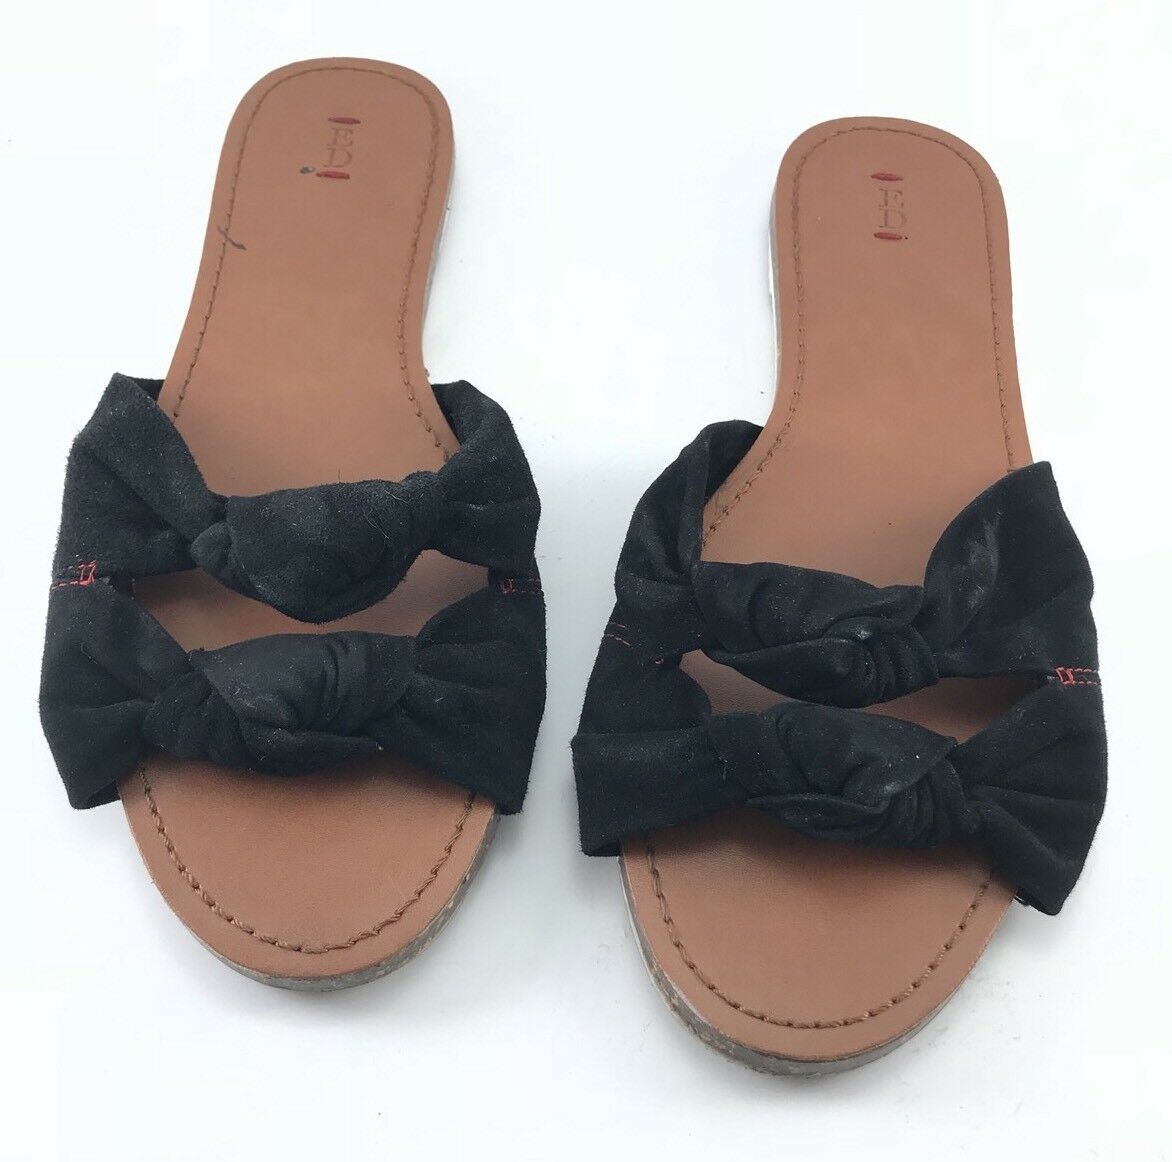 ED ELLEN DEGENERES Black SuedeBow Size Leather Womens Love Sandals Size SuedeBow 9 f096fa